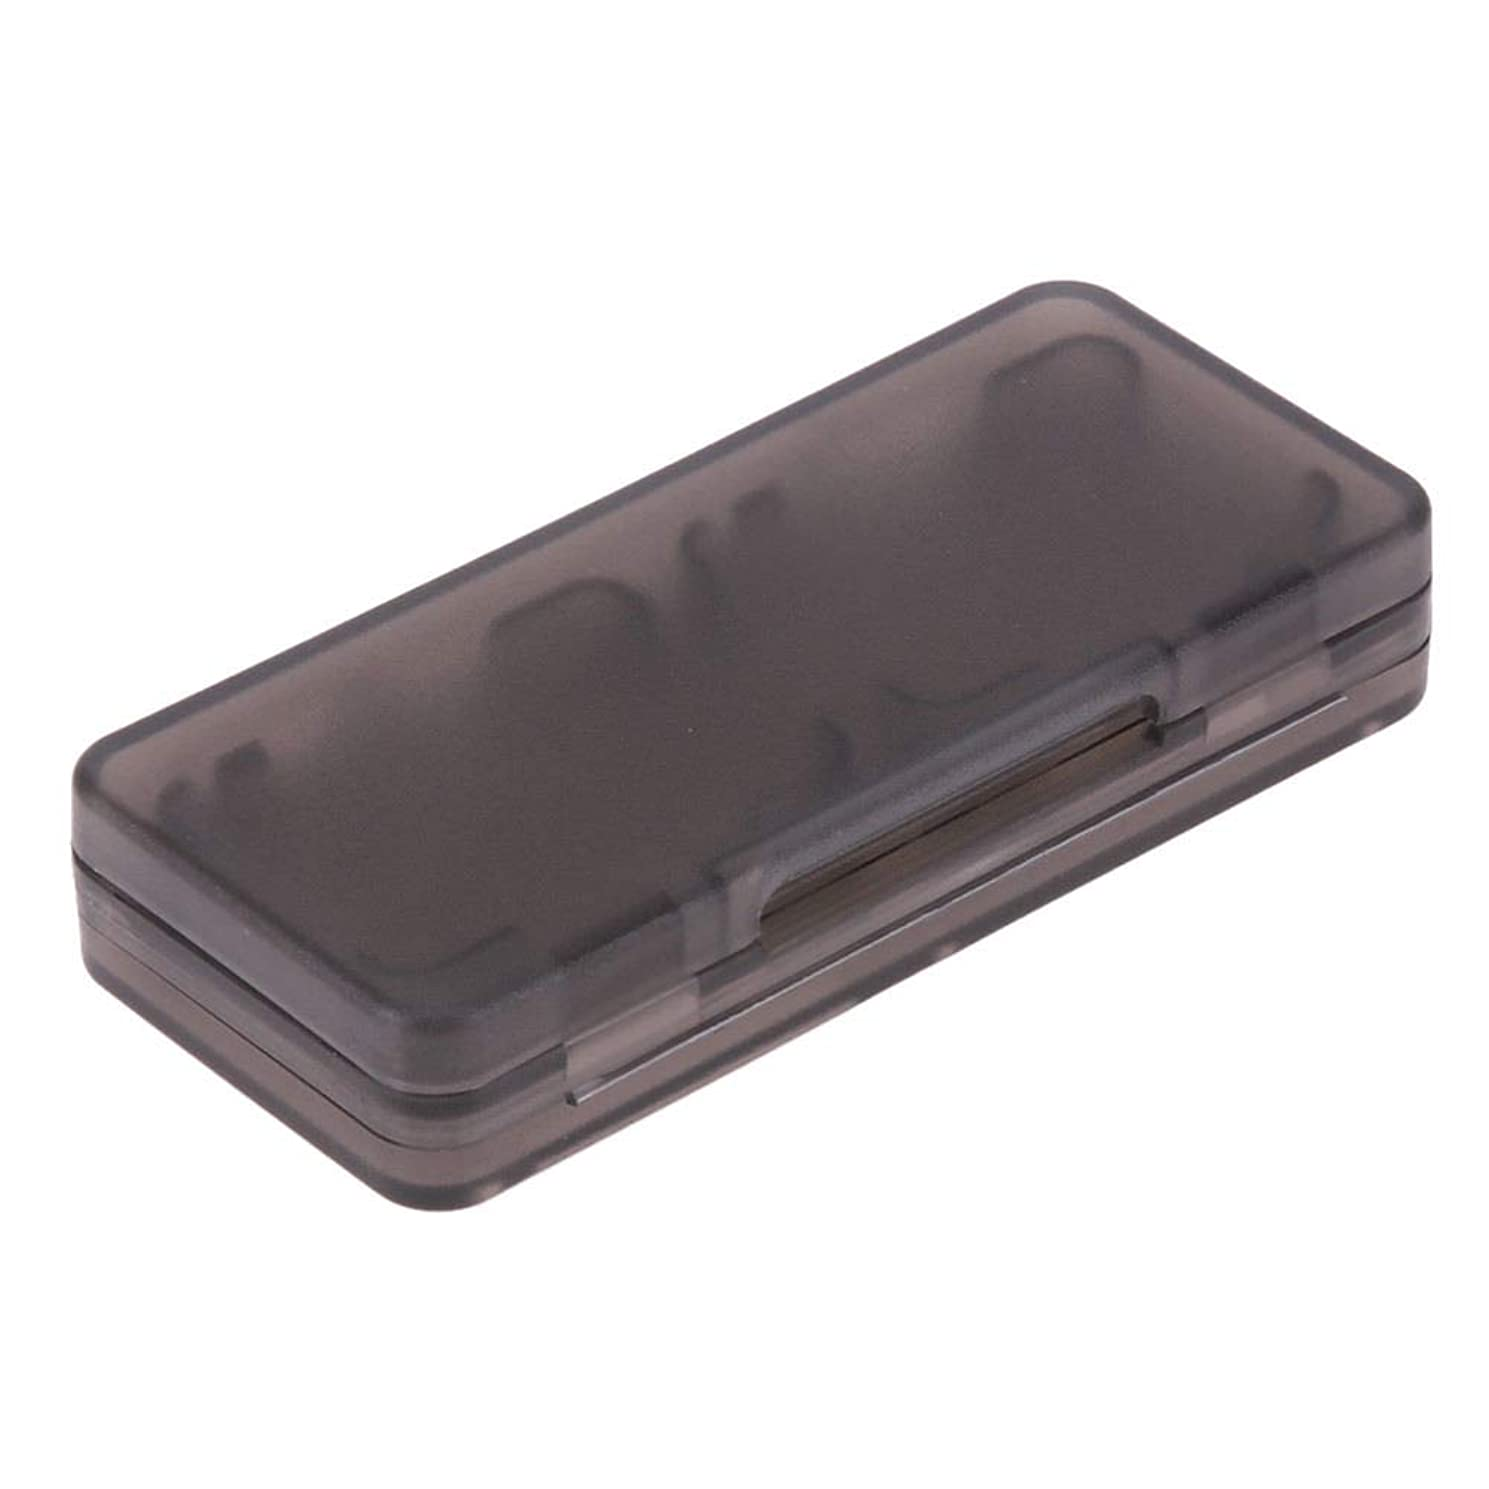 FidgetFidget Memory Card Holder Storage Case Box Plastic for Switch 3DS 4 in 1 Game